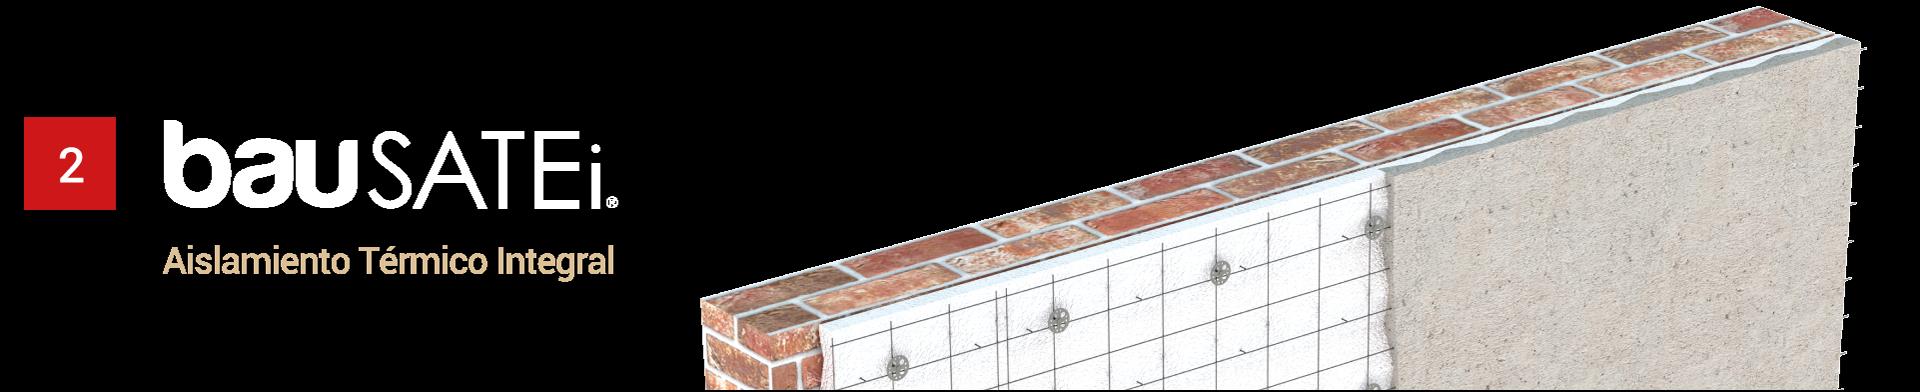 Bausatei, envolvente térmica para restauraciones de edificios